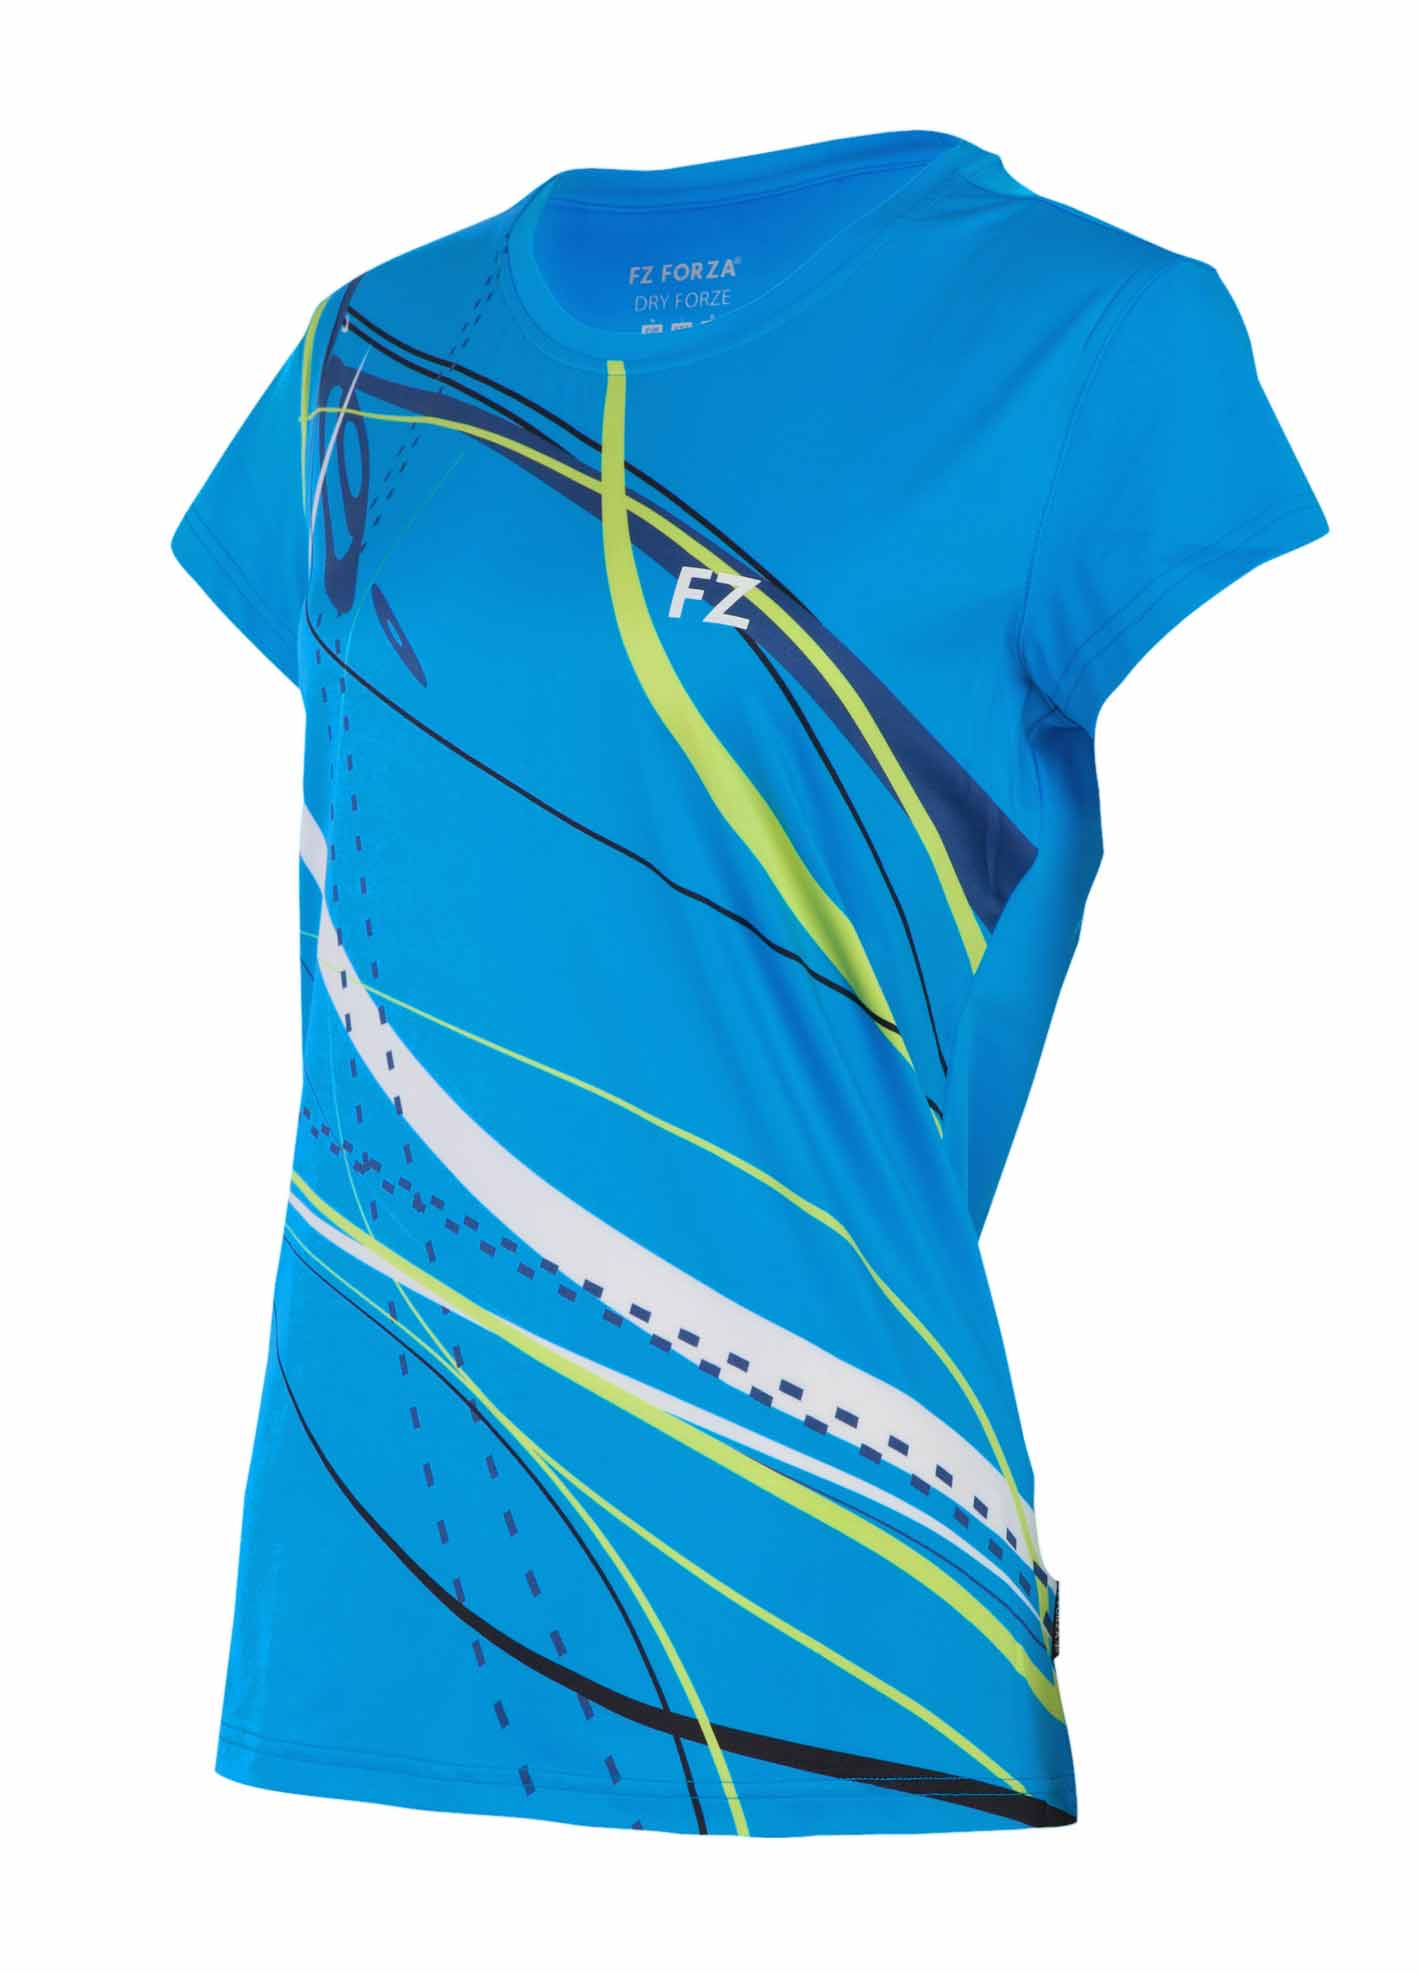 Forza mary t-shirt women fra Forza på billigsport24